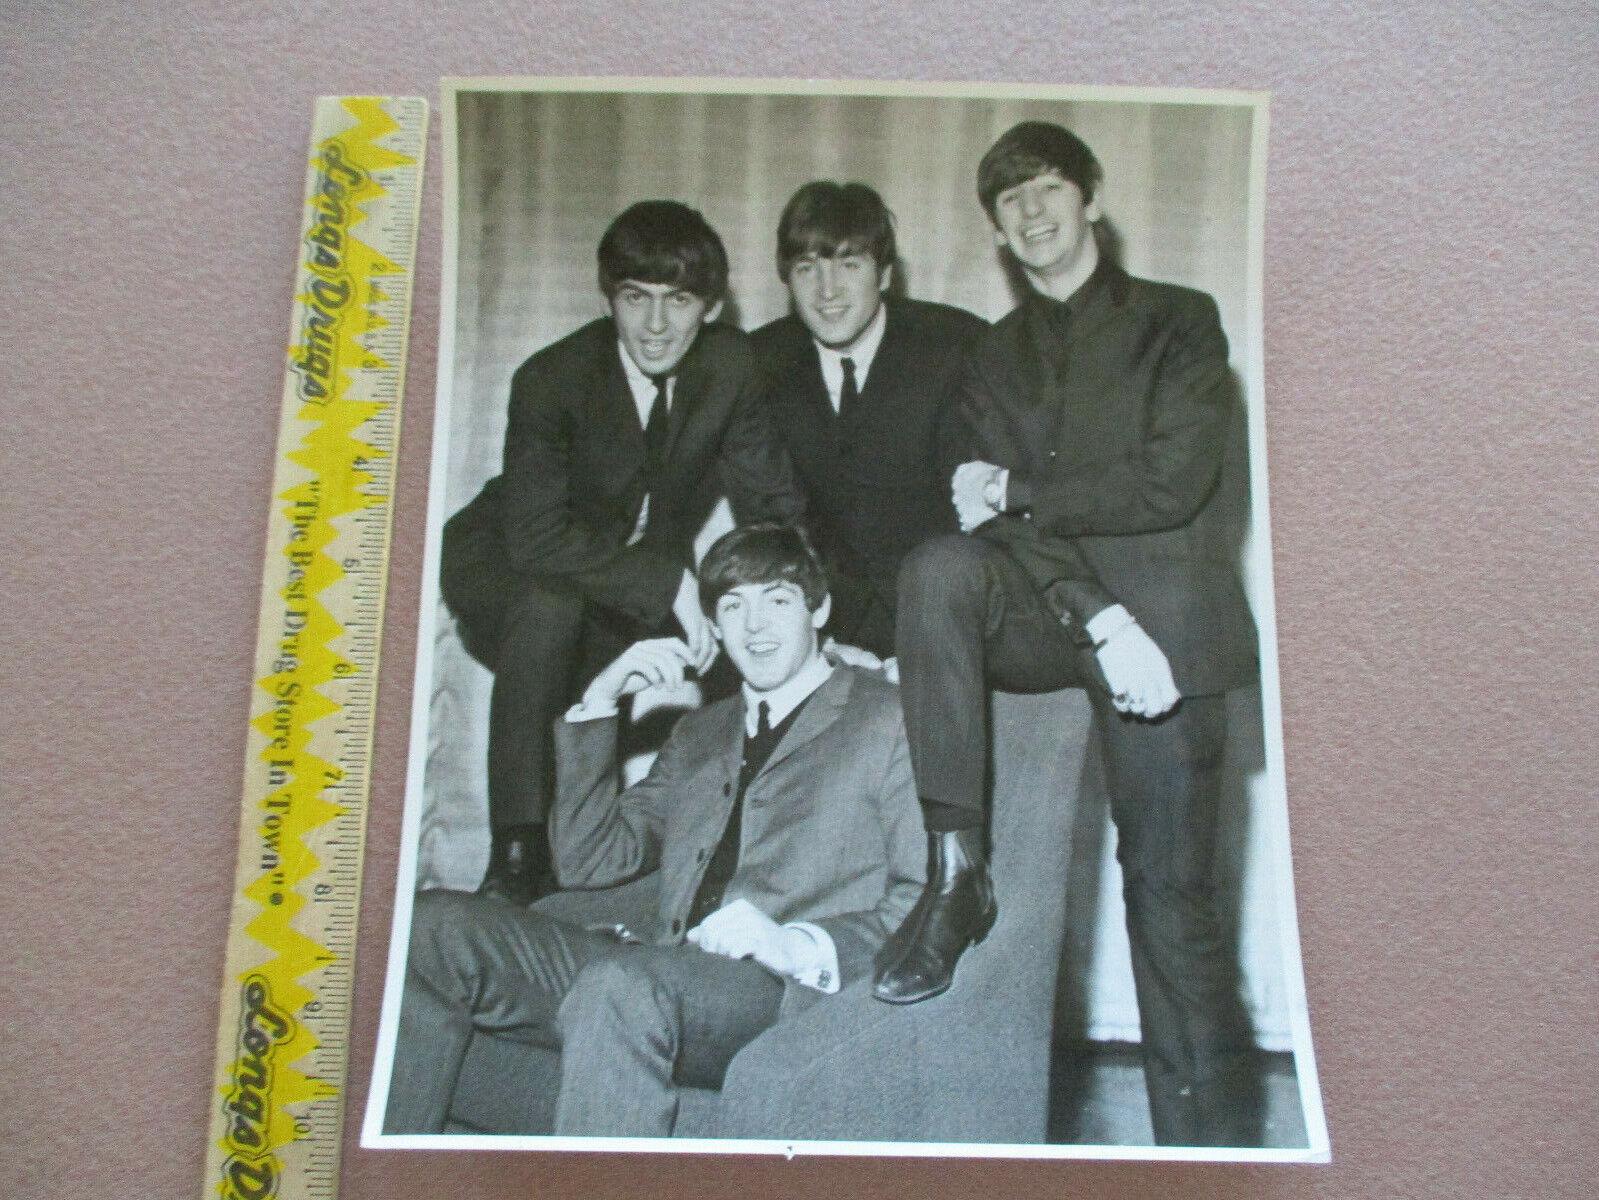 The Beatles - Capitol Records Photographic Studio 8 X 10 Photo File #10816-4 $25